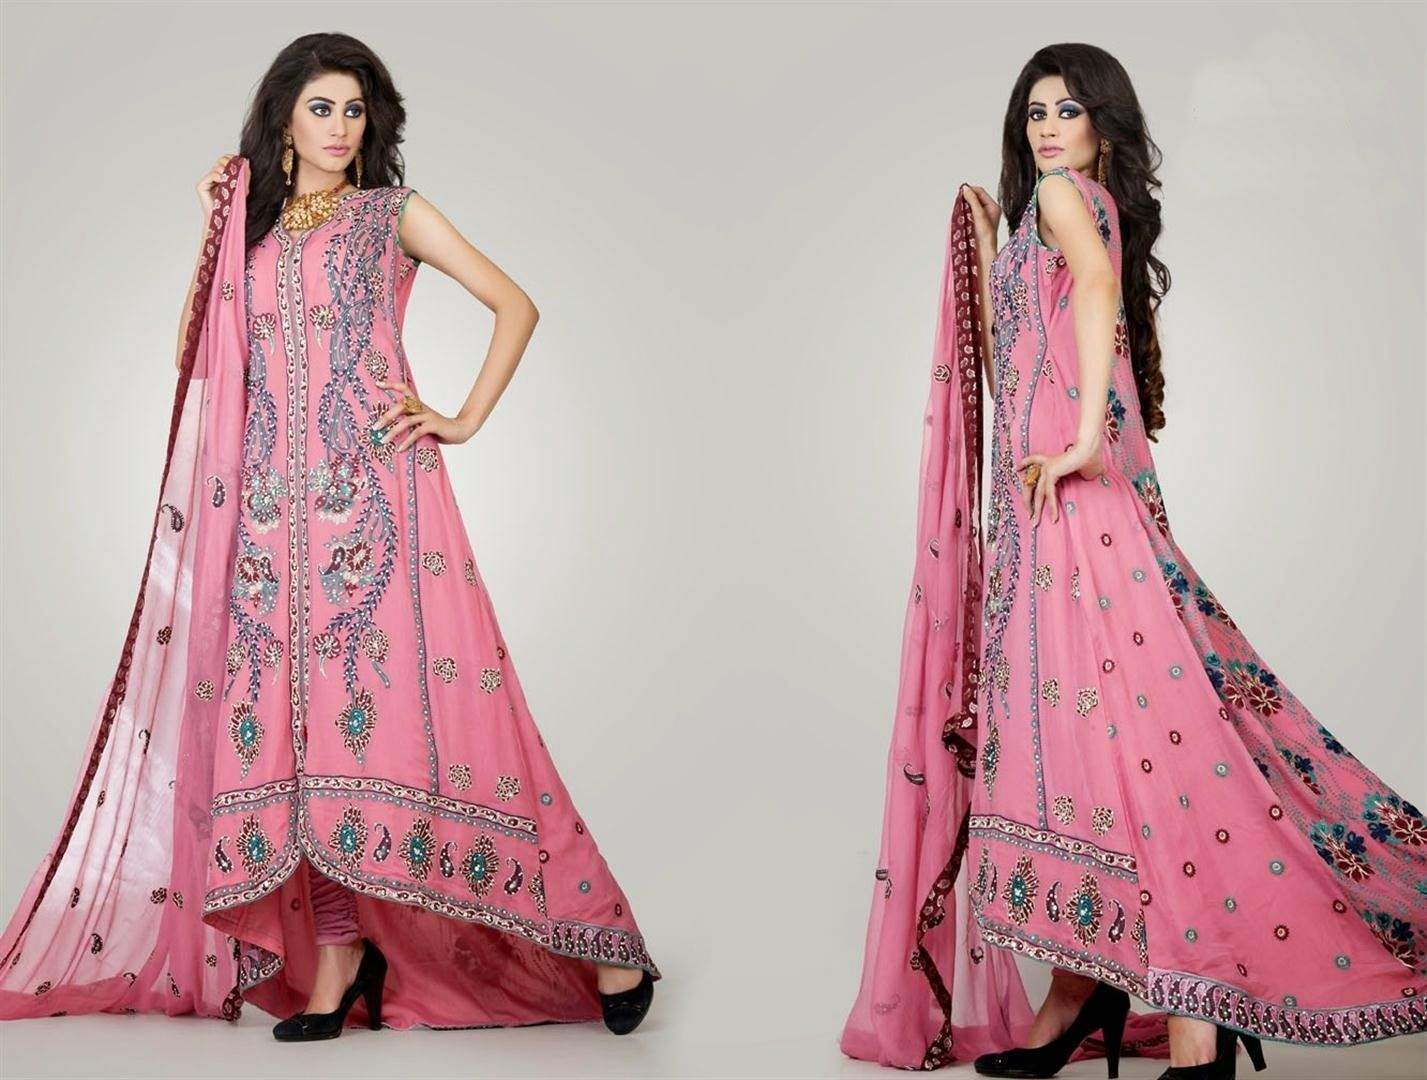 simple pakistani wedding dress couture - Jixy Wedding | Wedding ...